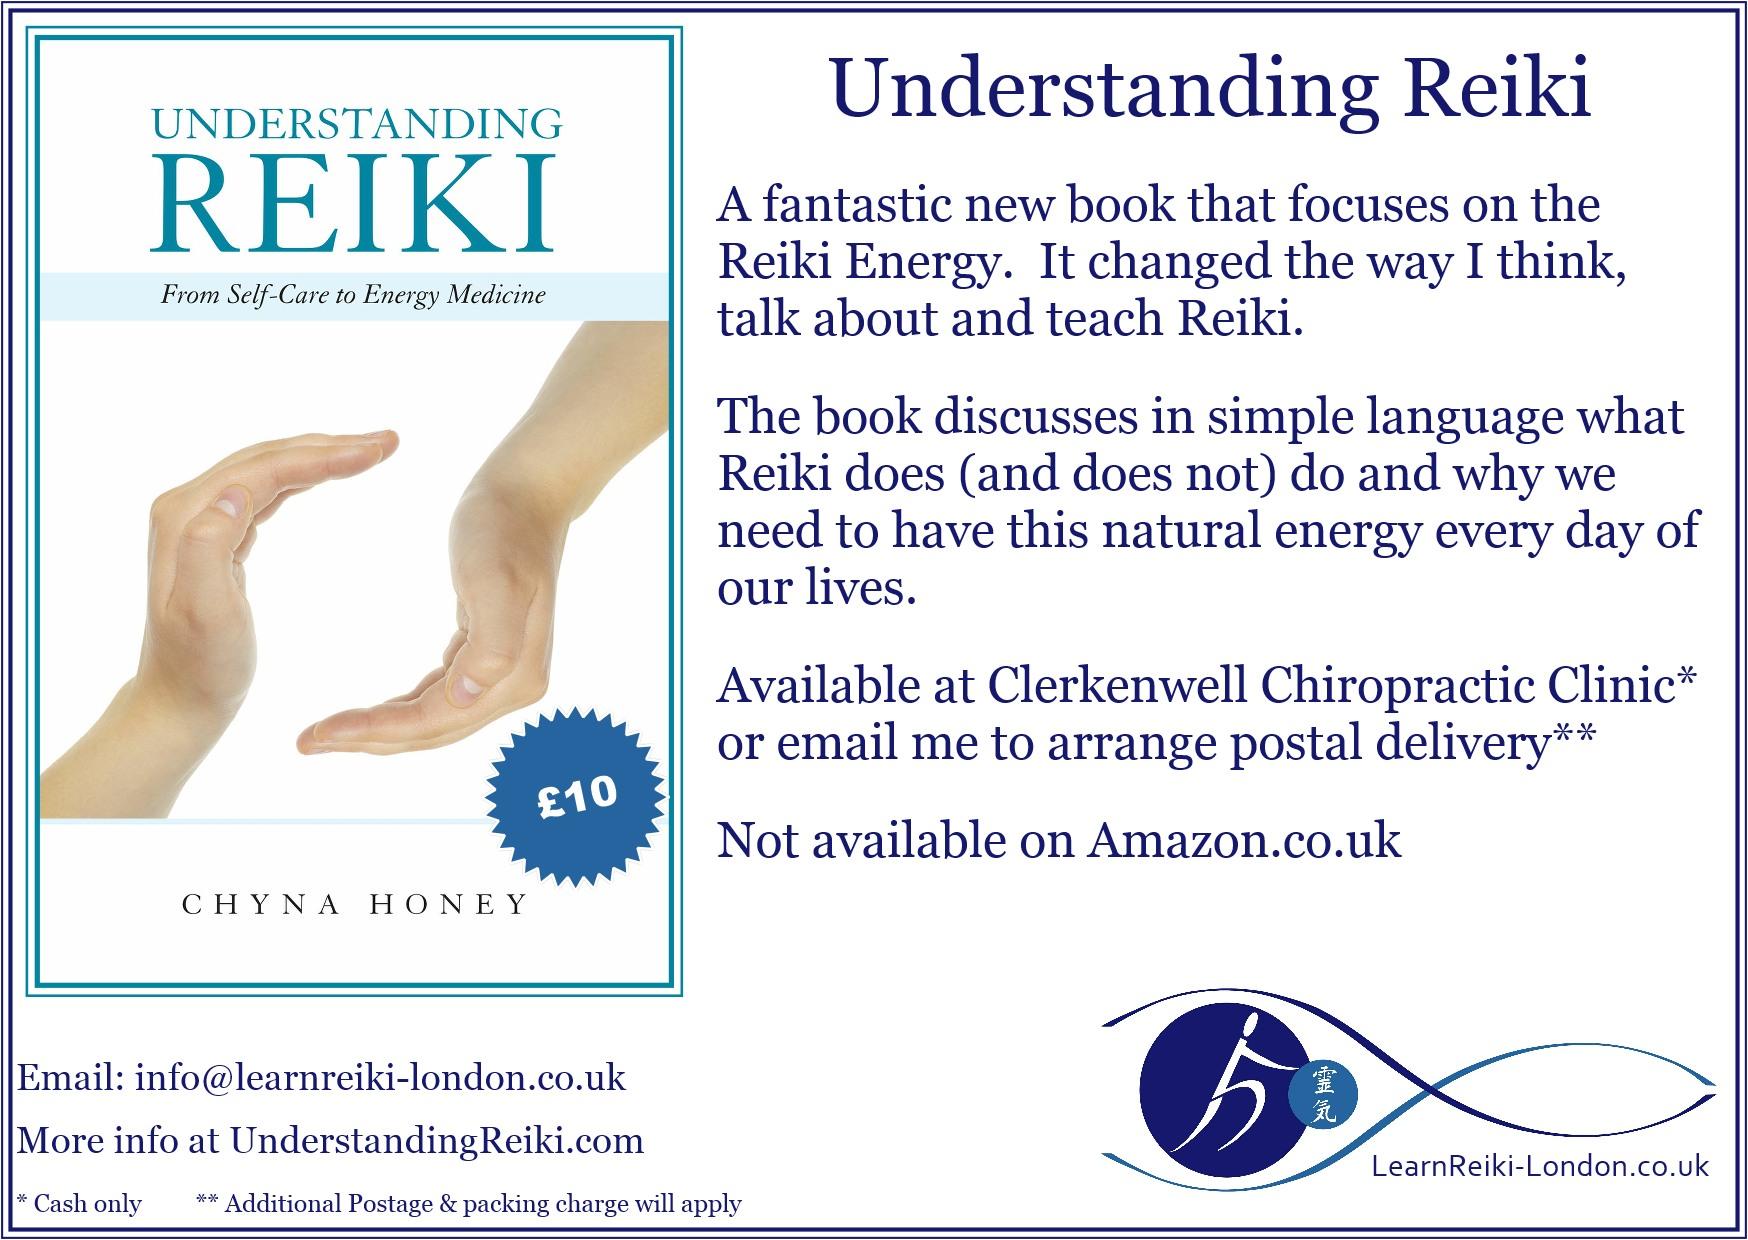 Understanding Reiki book sales